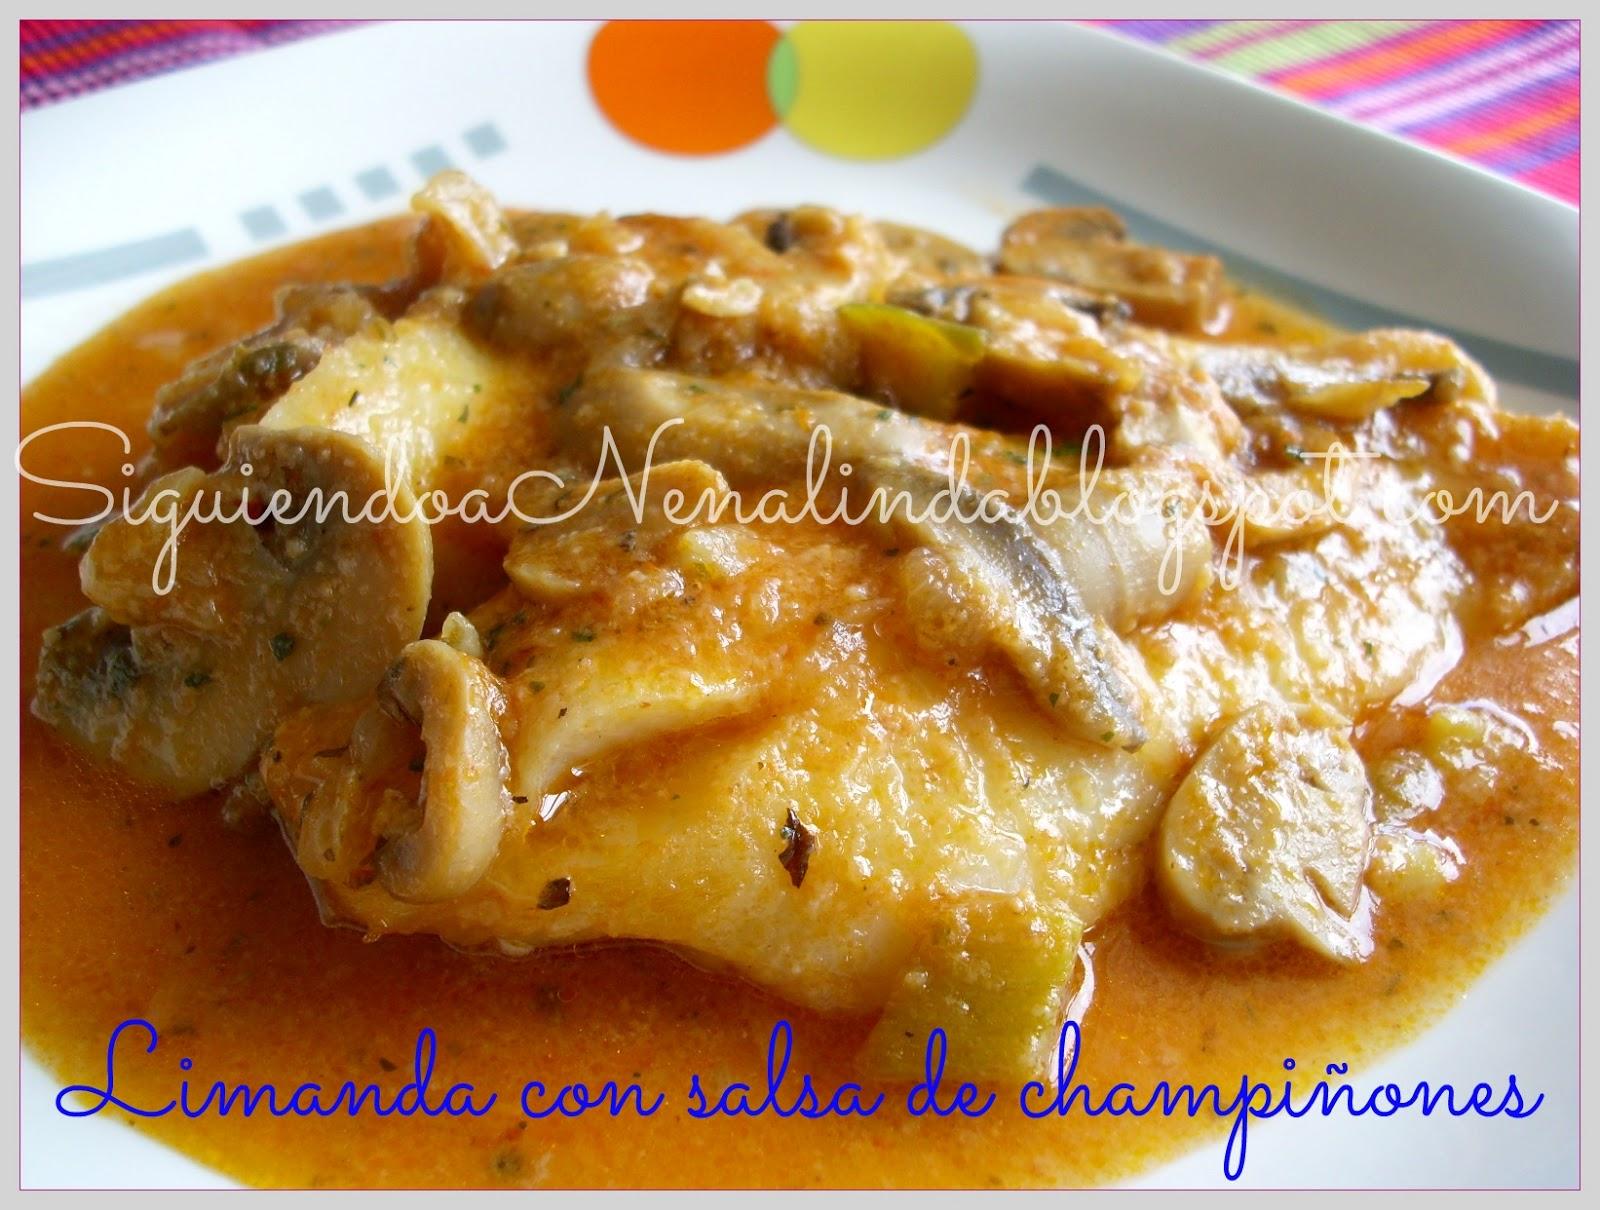 Siguiendo a nenalinda limanda en salsa de champi ones - Pescado al microondas facil ...